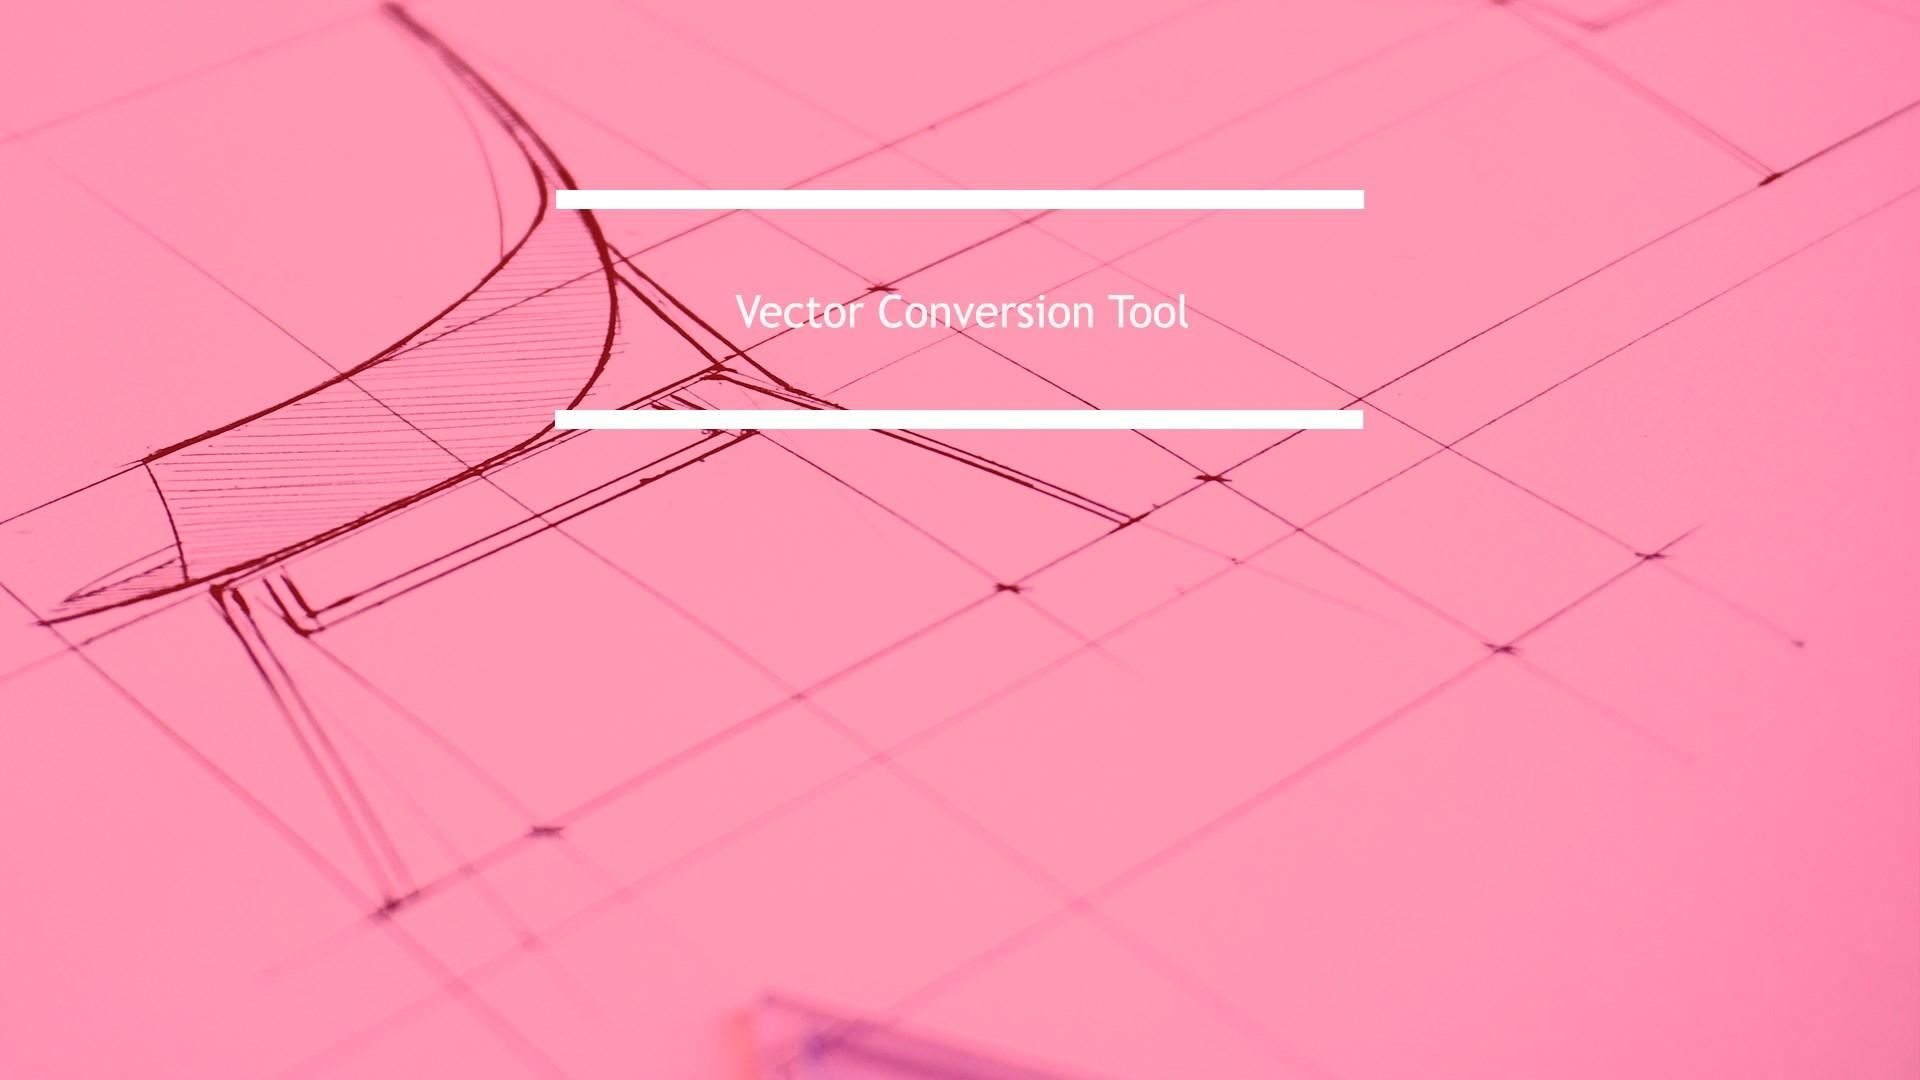 Buy Vector Conversion Tool - Microsoft Store